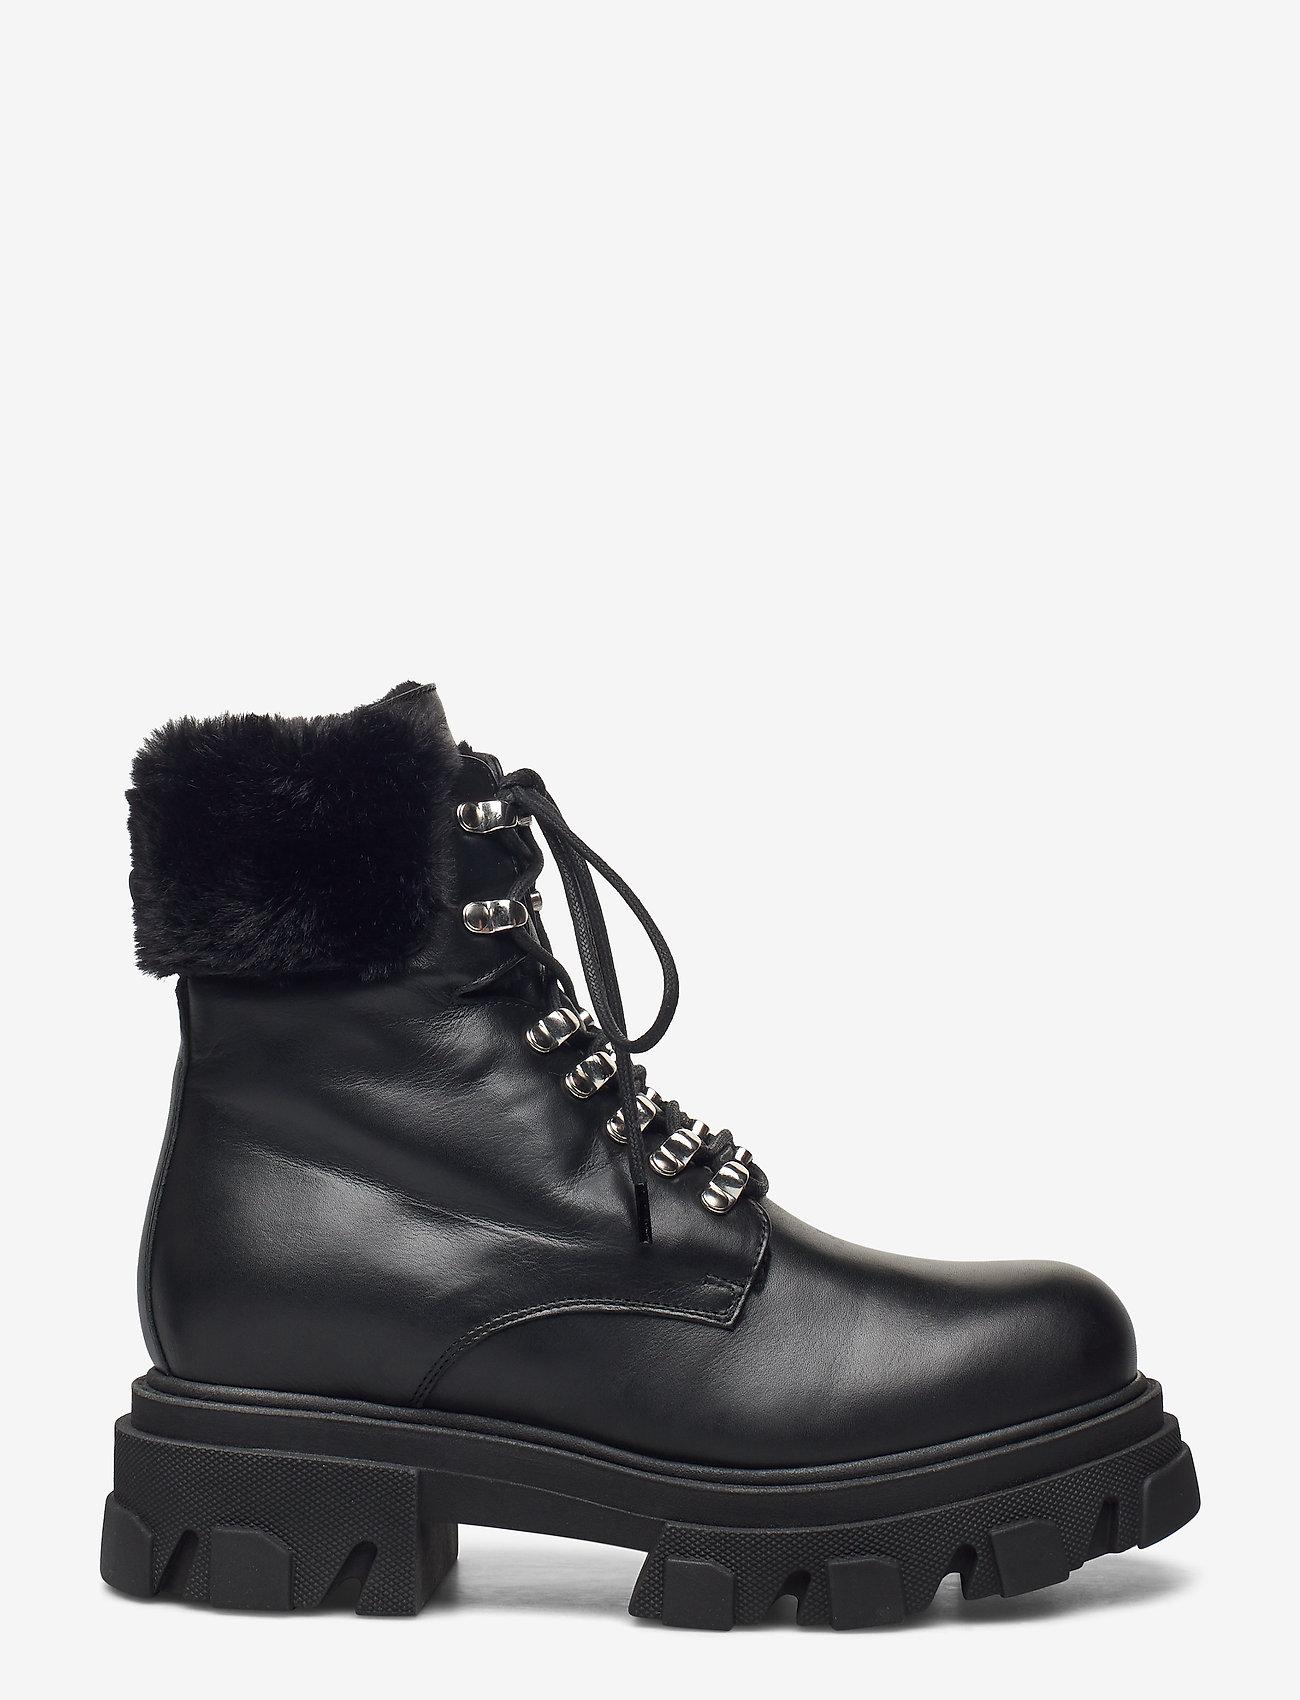 Apair - Chuncky ski - flat ankle boots - nero - 1